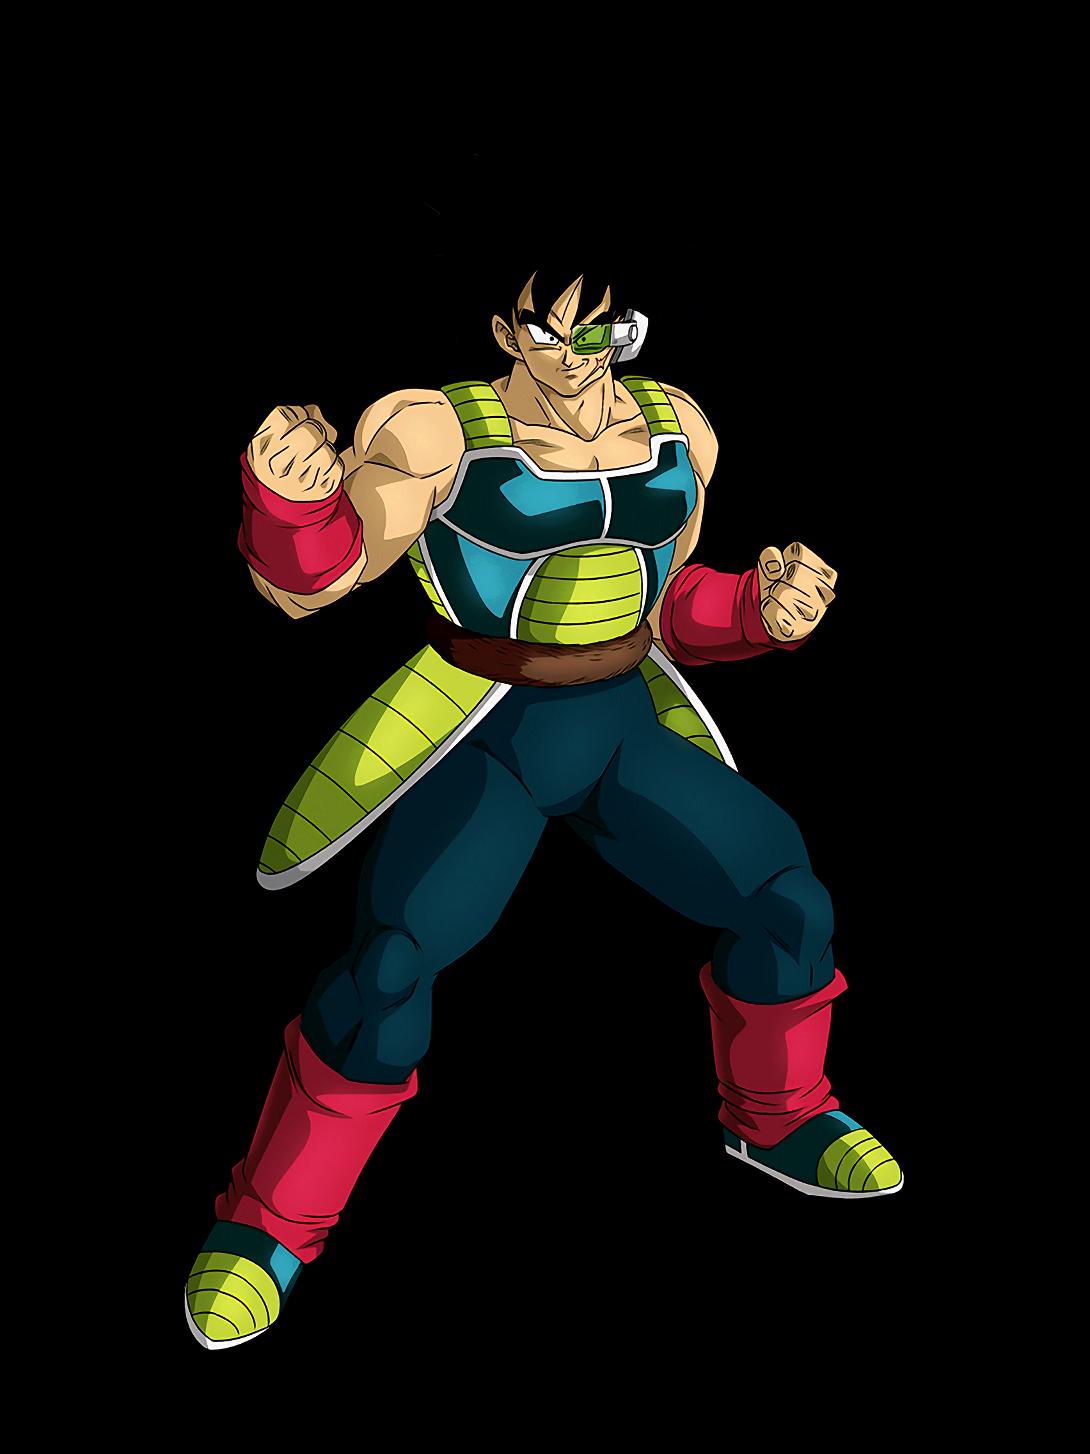 Bardock Render 4 Dokkan Battle By Maxiuchiha22 On Deviantart Dragon Ball Z Dragon Ball Dragon